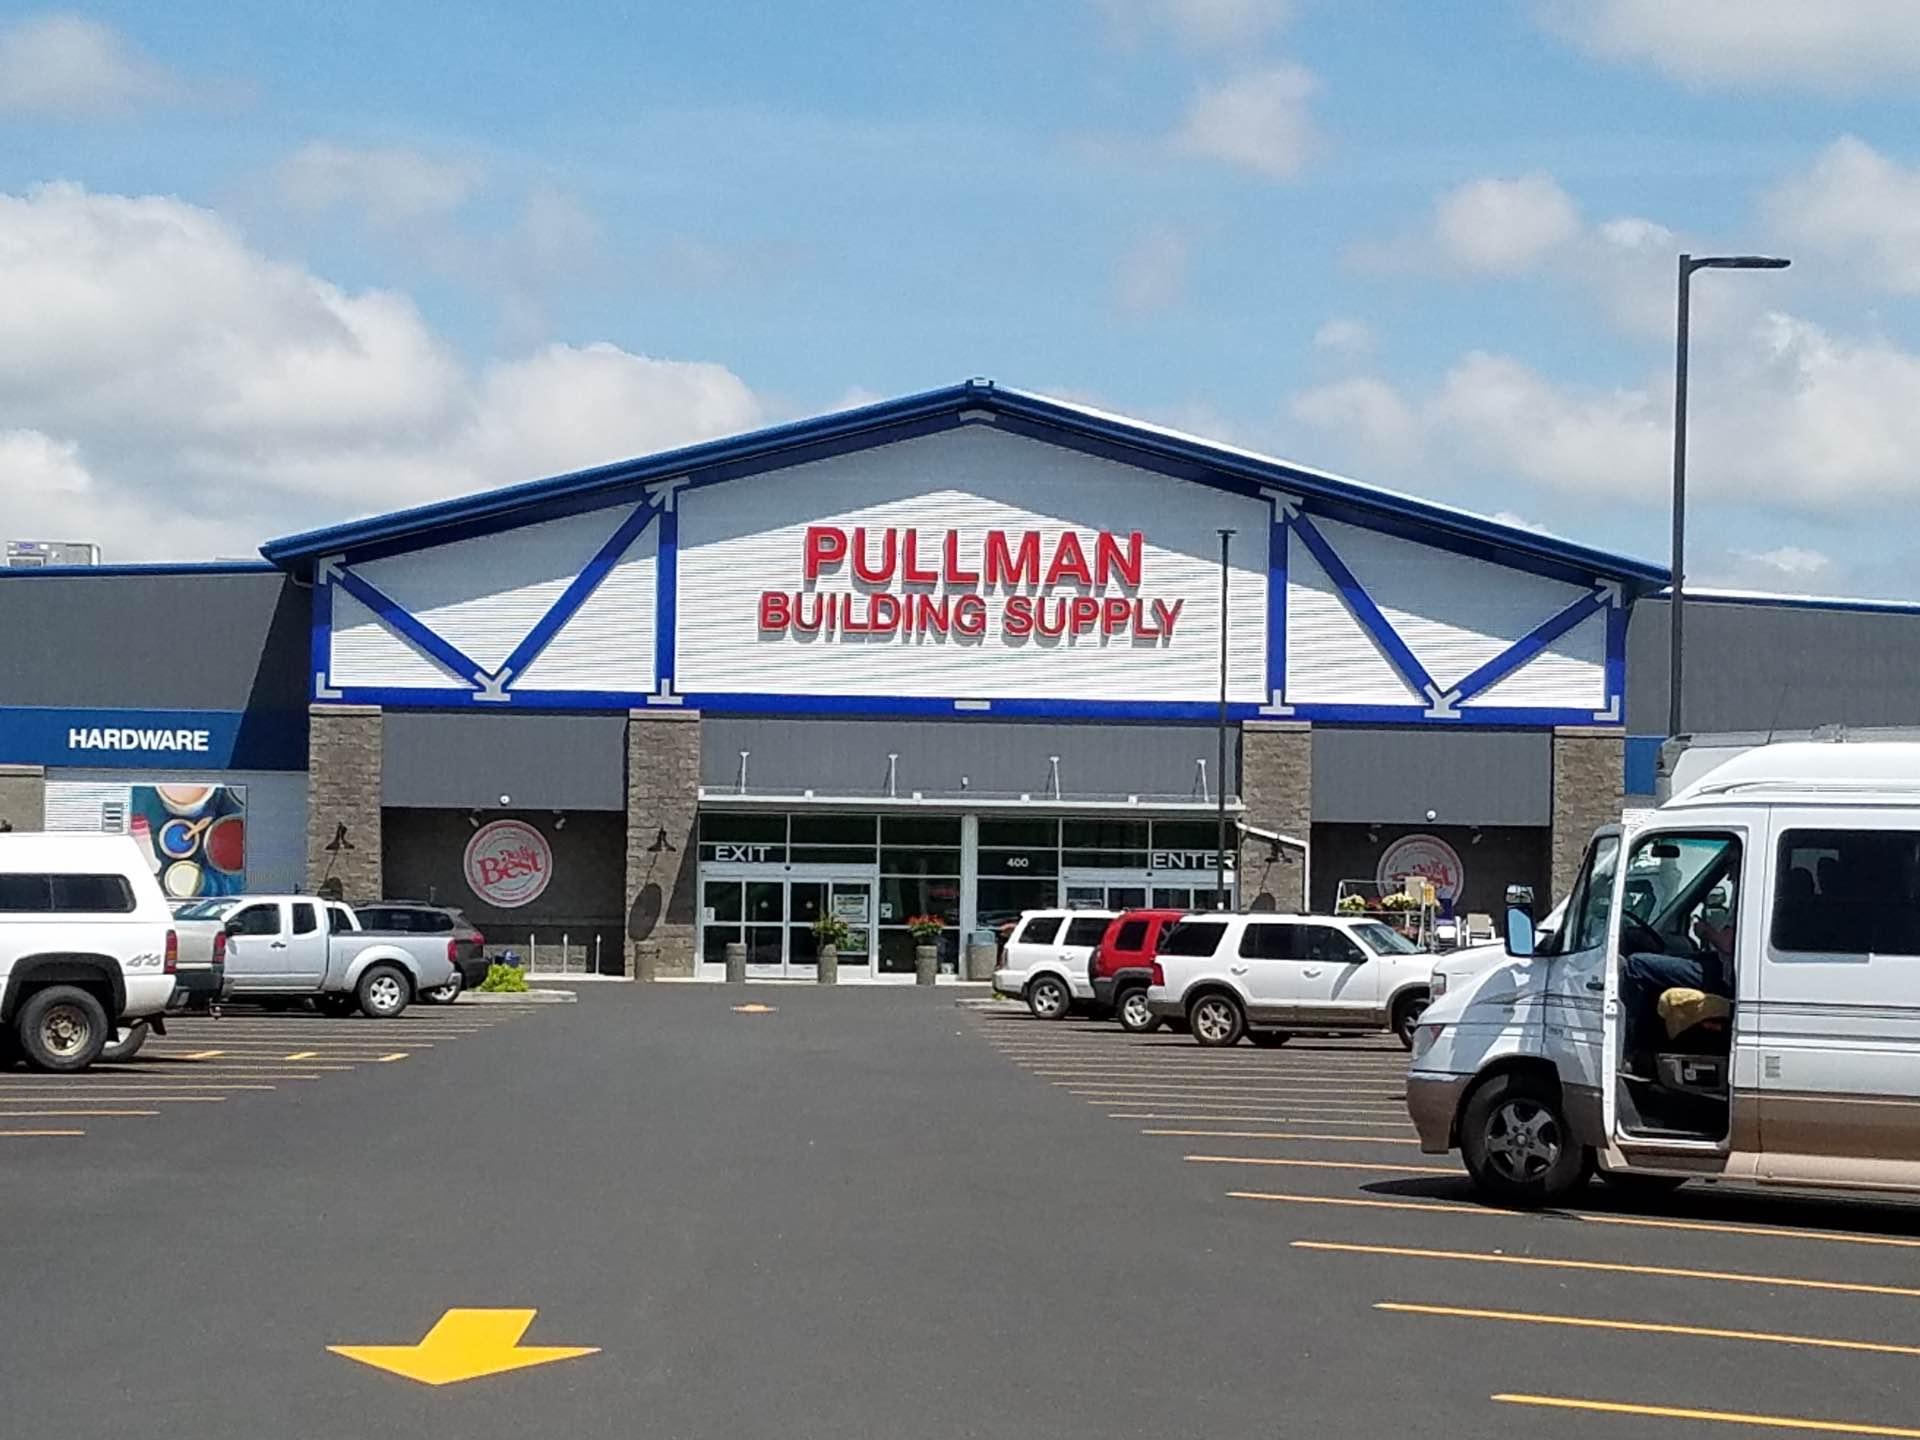 Pullman Building Supply